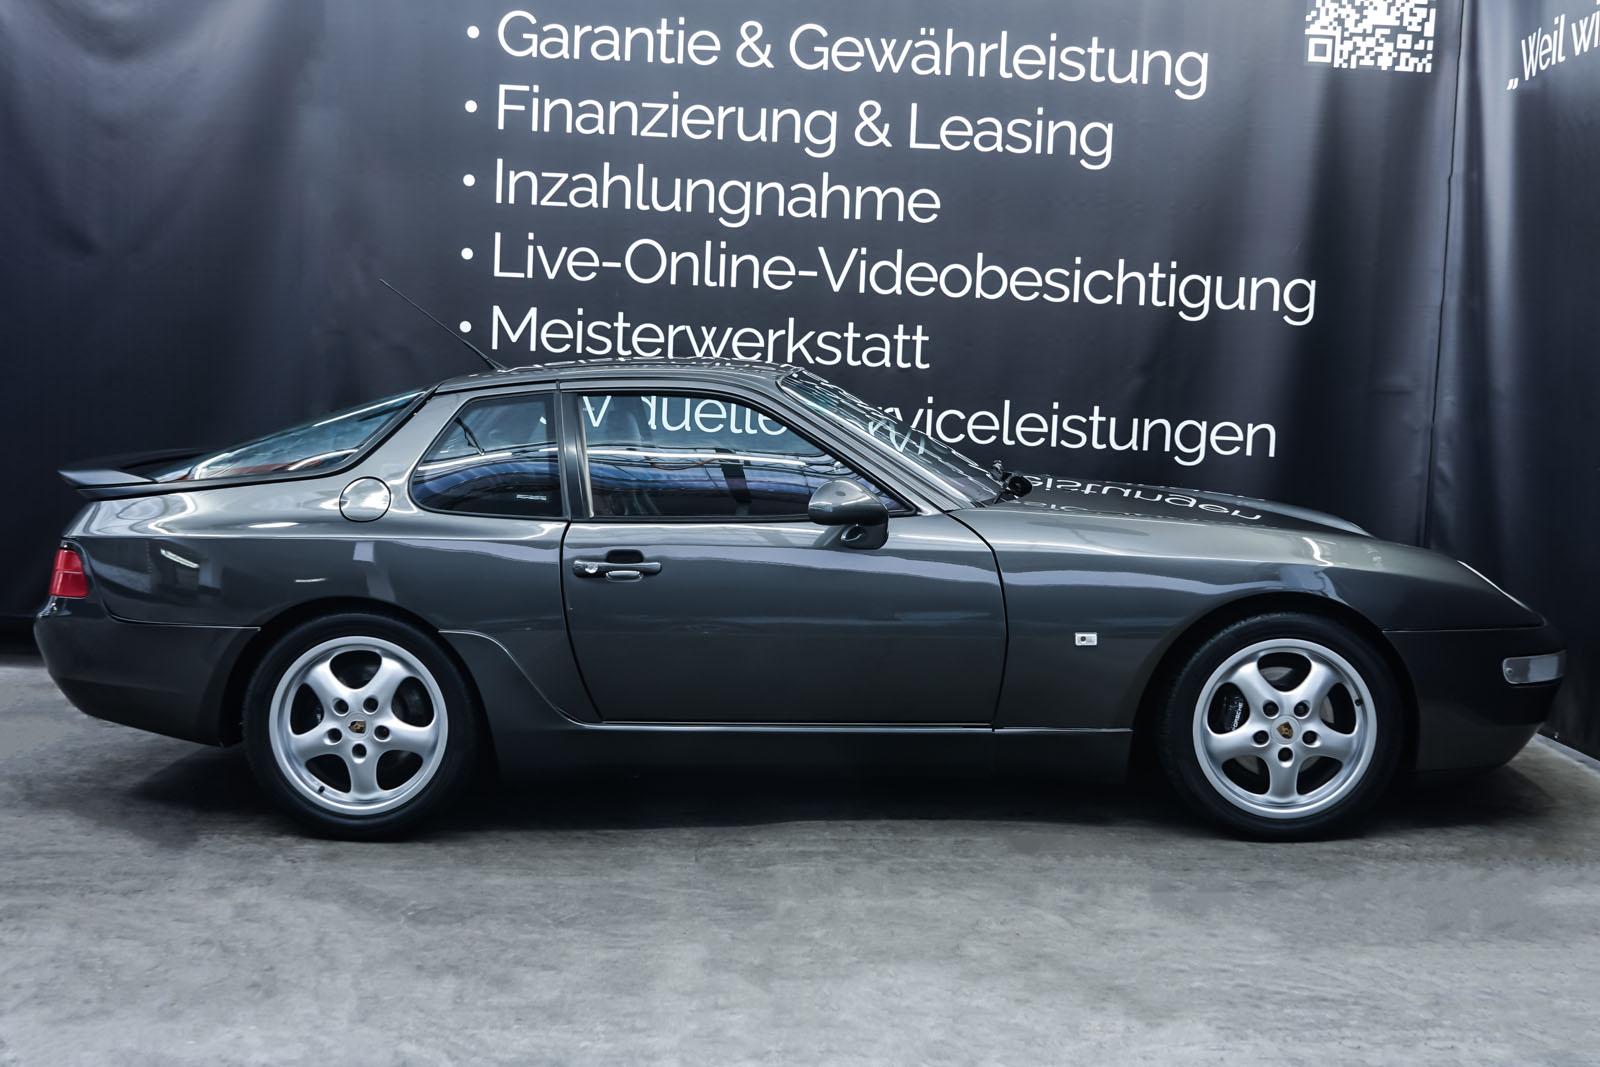 Porsche_986_Targa_Grau_Pink_POR-1092_14_w